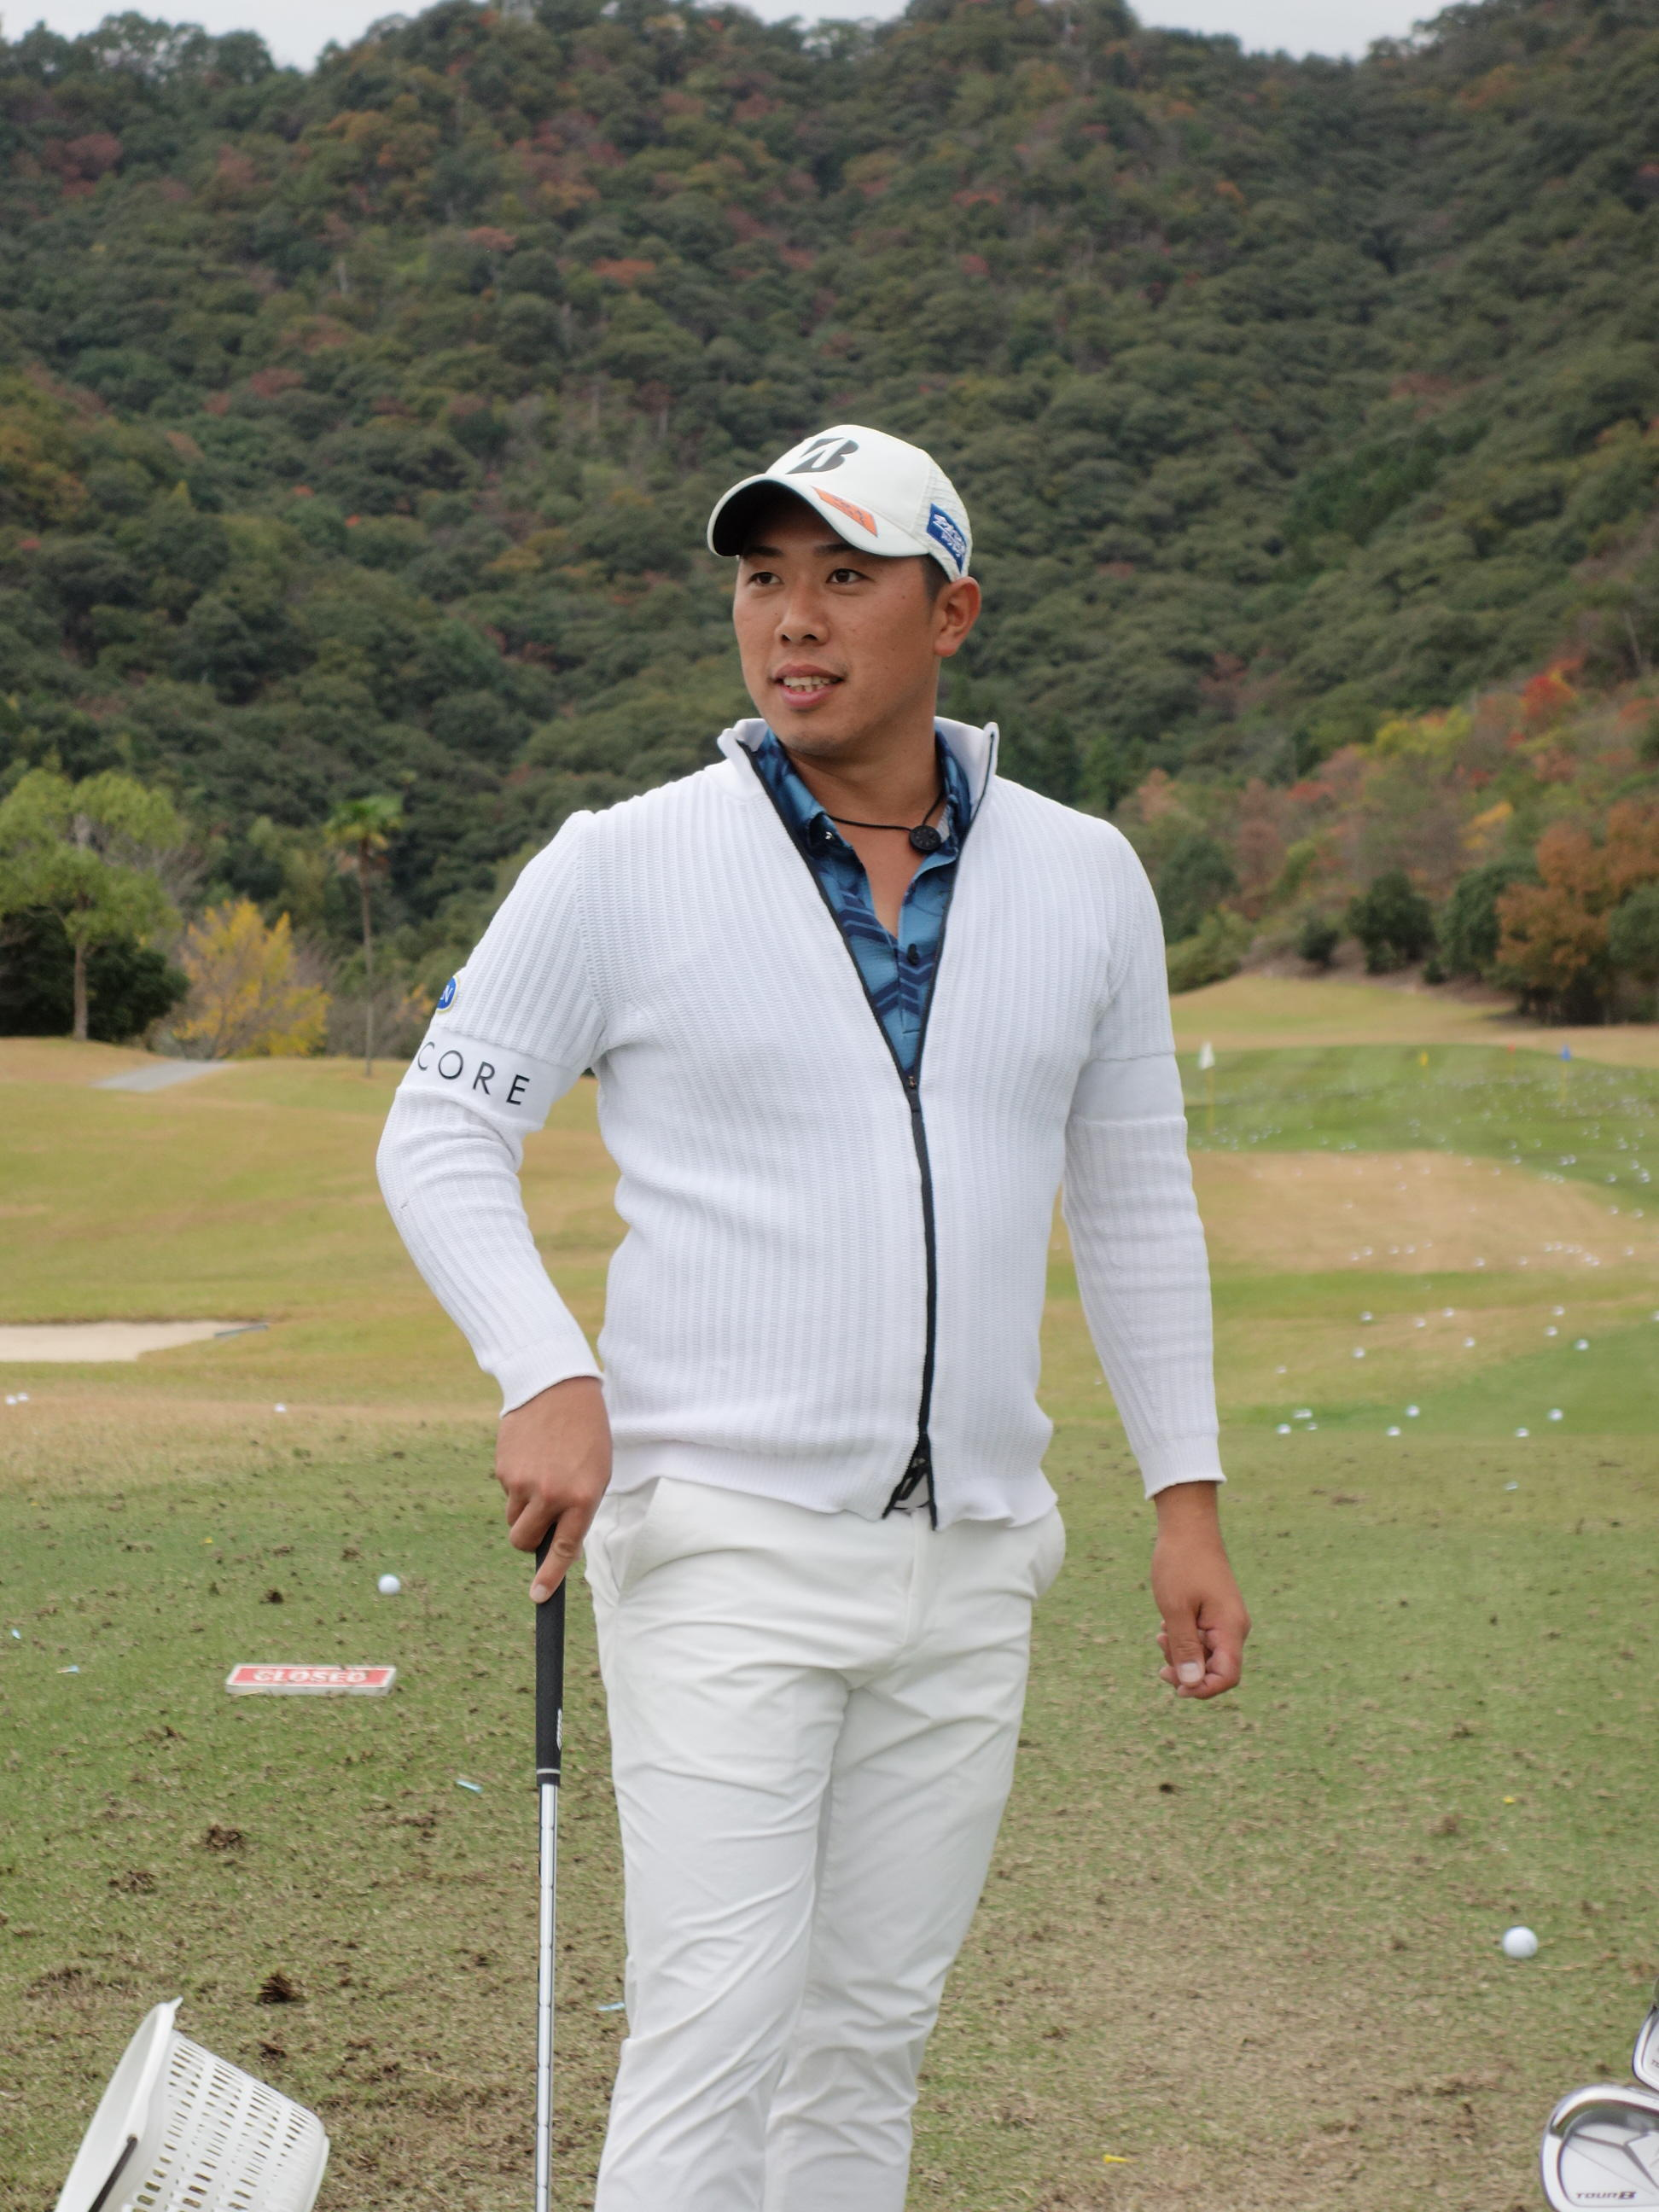 https://www.bs-golf.com/pro/52154fd2c3065db4f9bf80ce6a9a7dd41944e75c.JPG